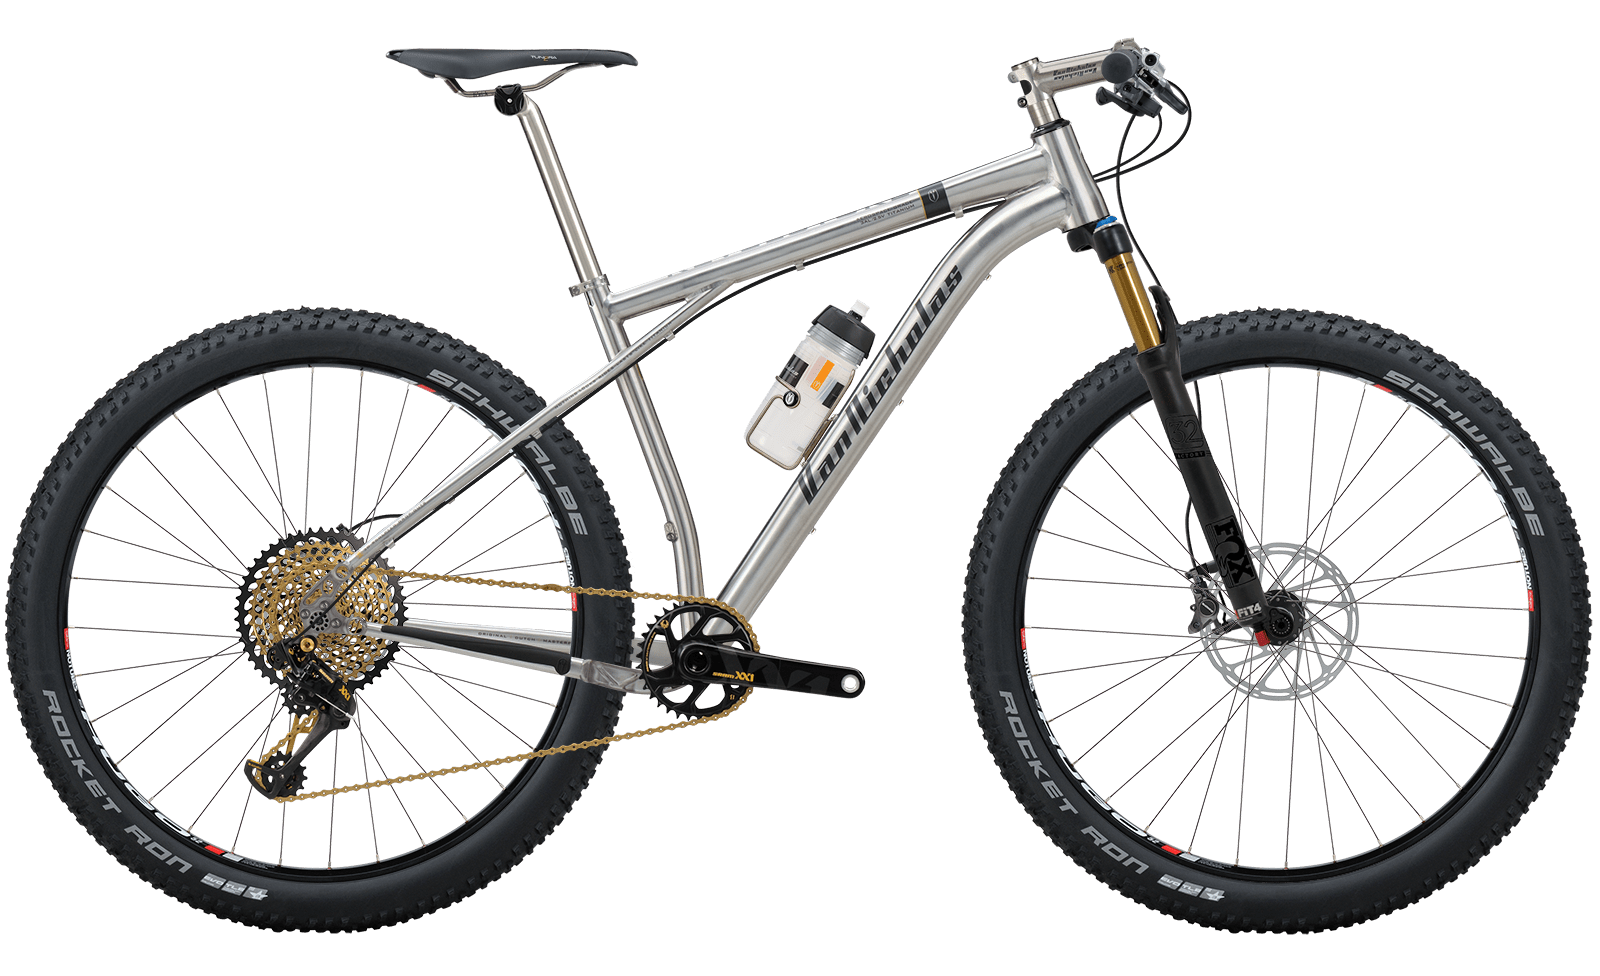 Van-Nicholas Revelstoke titanium mountainbike